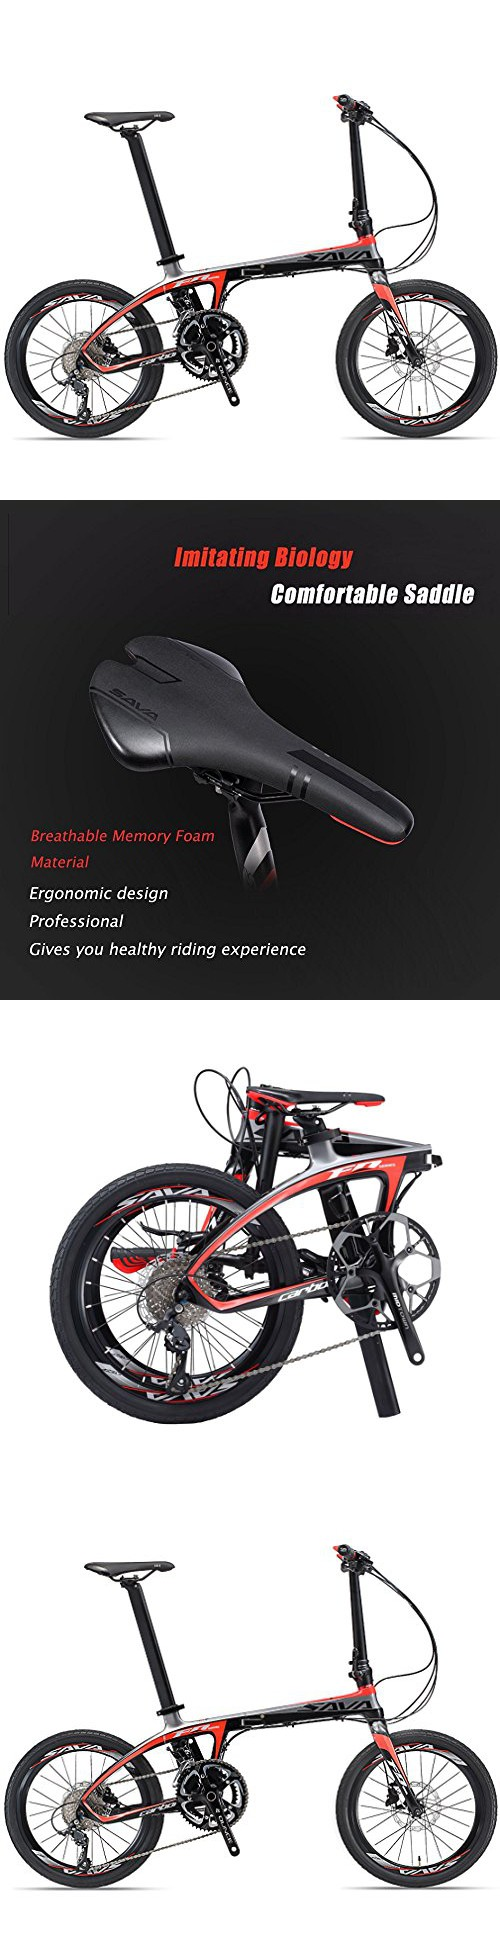 Savadeck Cricket 20 Inch Folding Bike T800 Carbon Fiber Frame Mini Compact City Bicycle With Shimano 3000 9 Speed Disc Brake Black Red Bike Carbon Fiber Bicycle